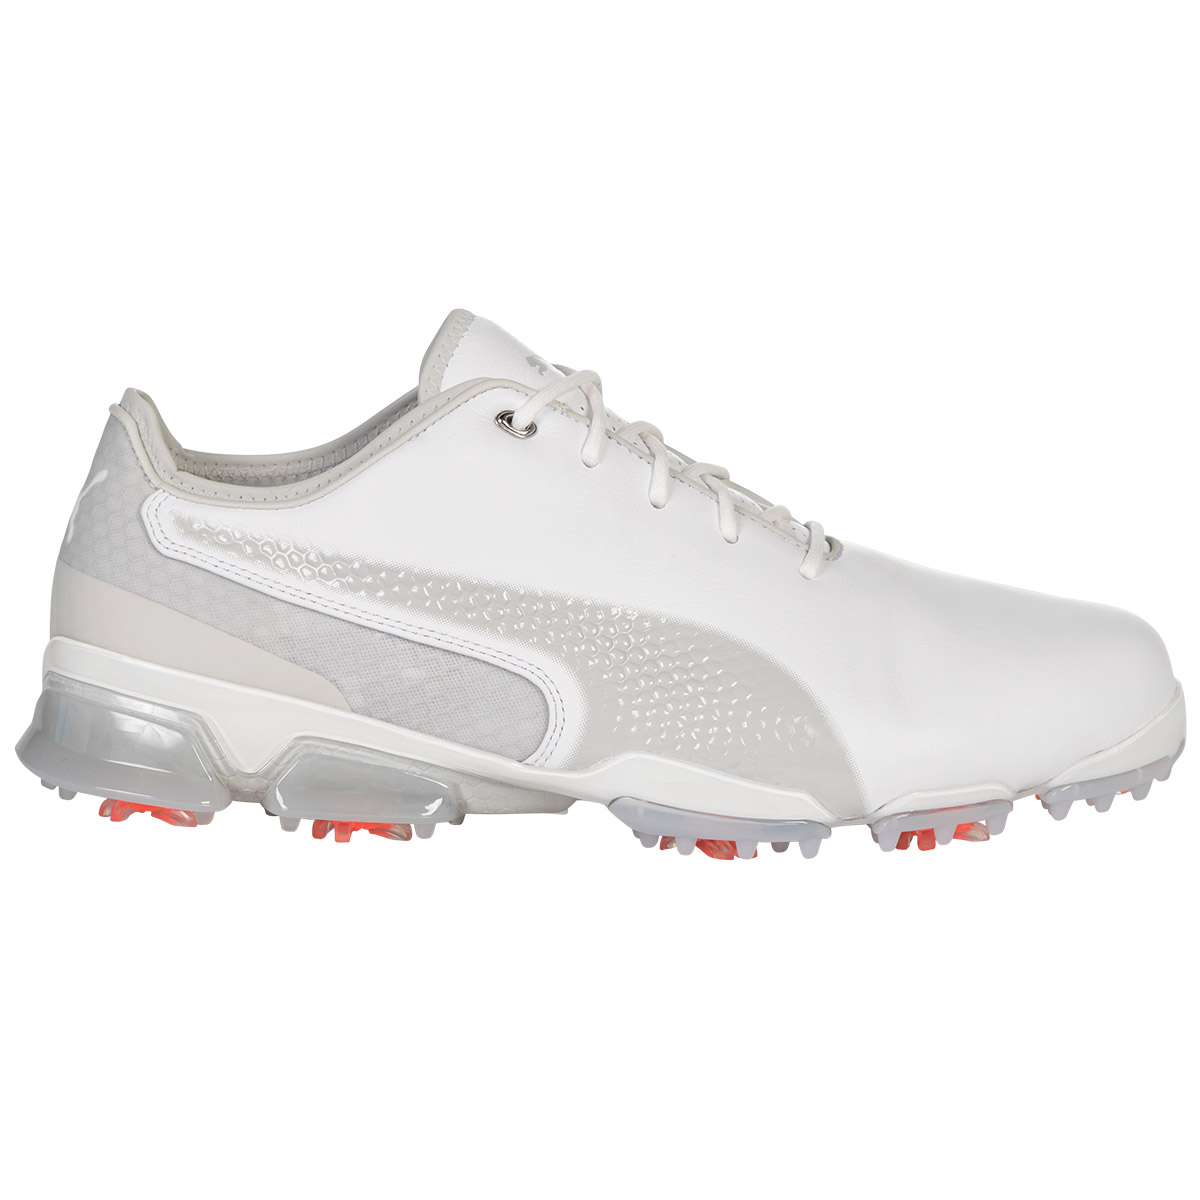 Chaussures PUMA Golf IGNITE PROADAPT